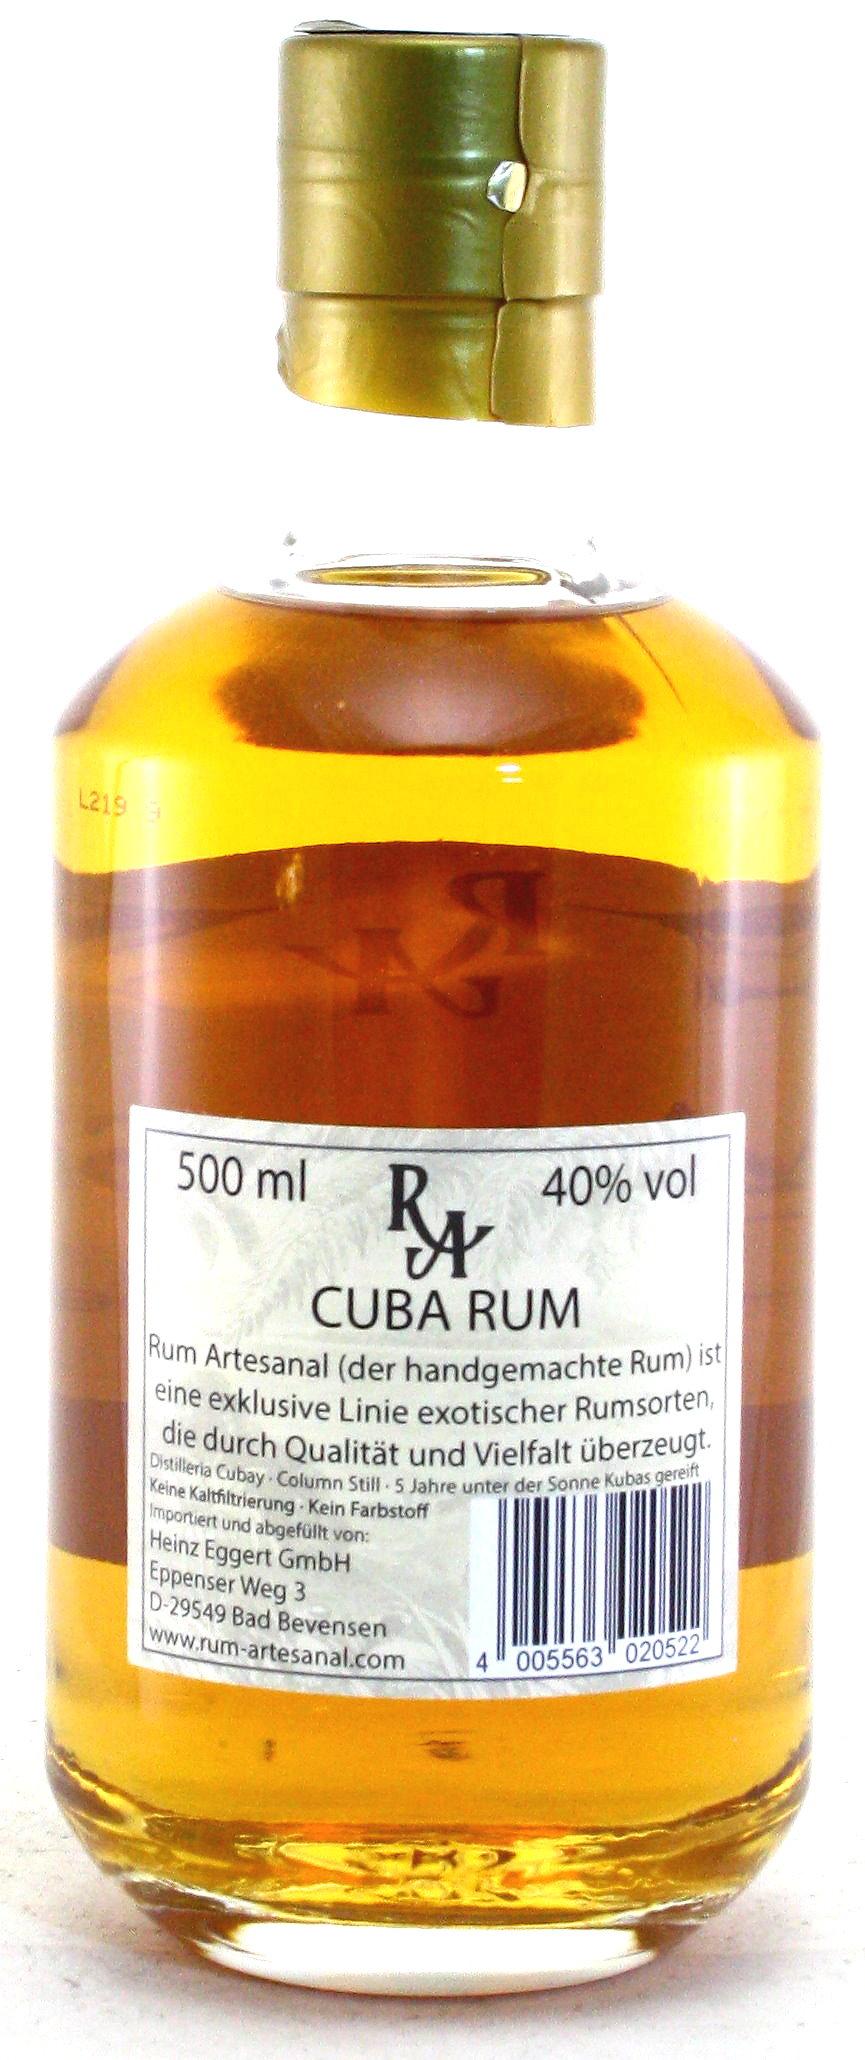 500 ml Ron de Republica de Cuba, Rum Artesanal Kuba